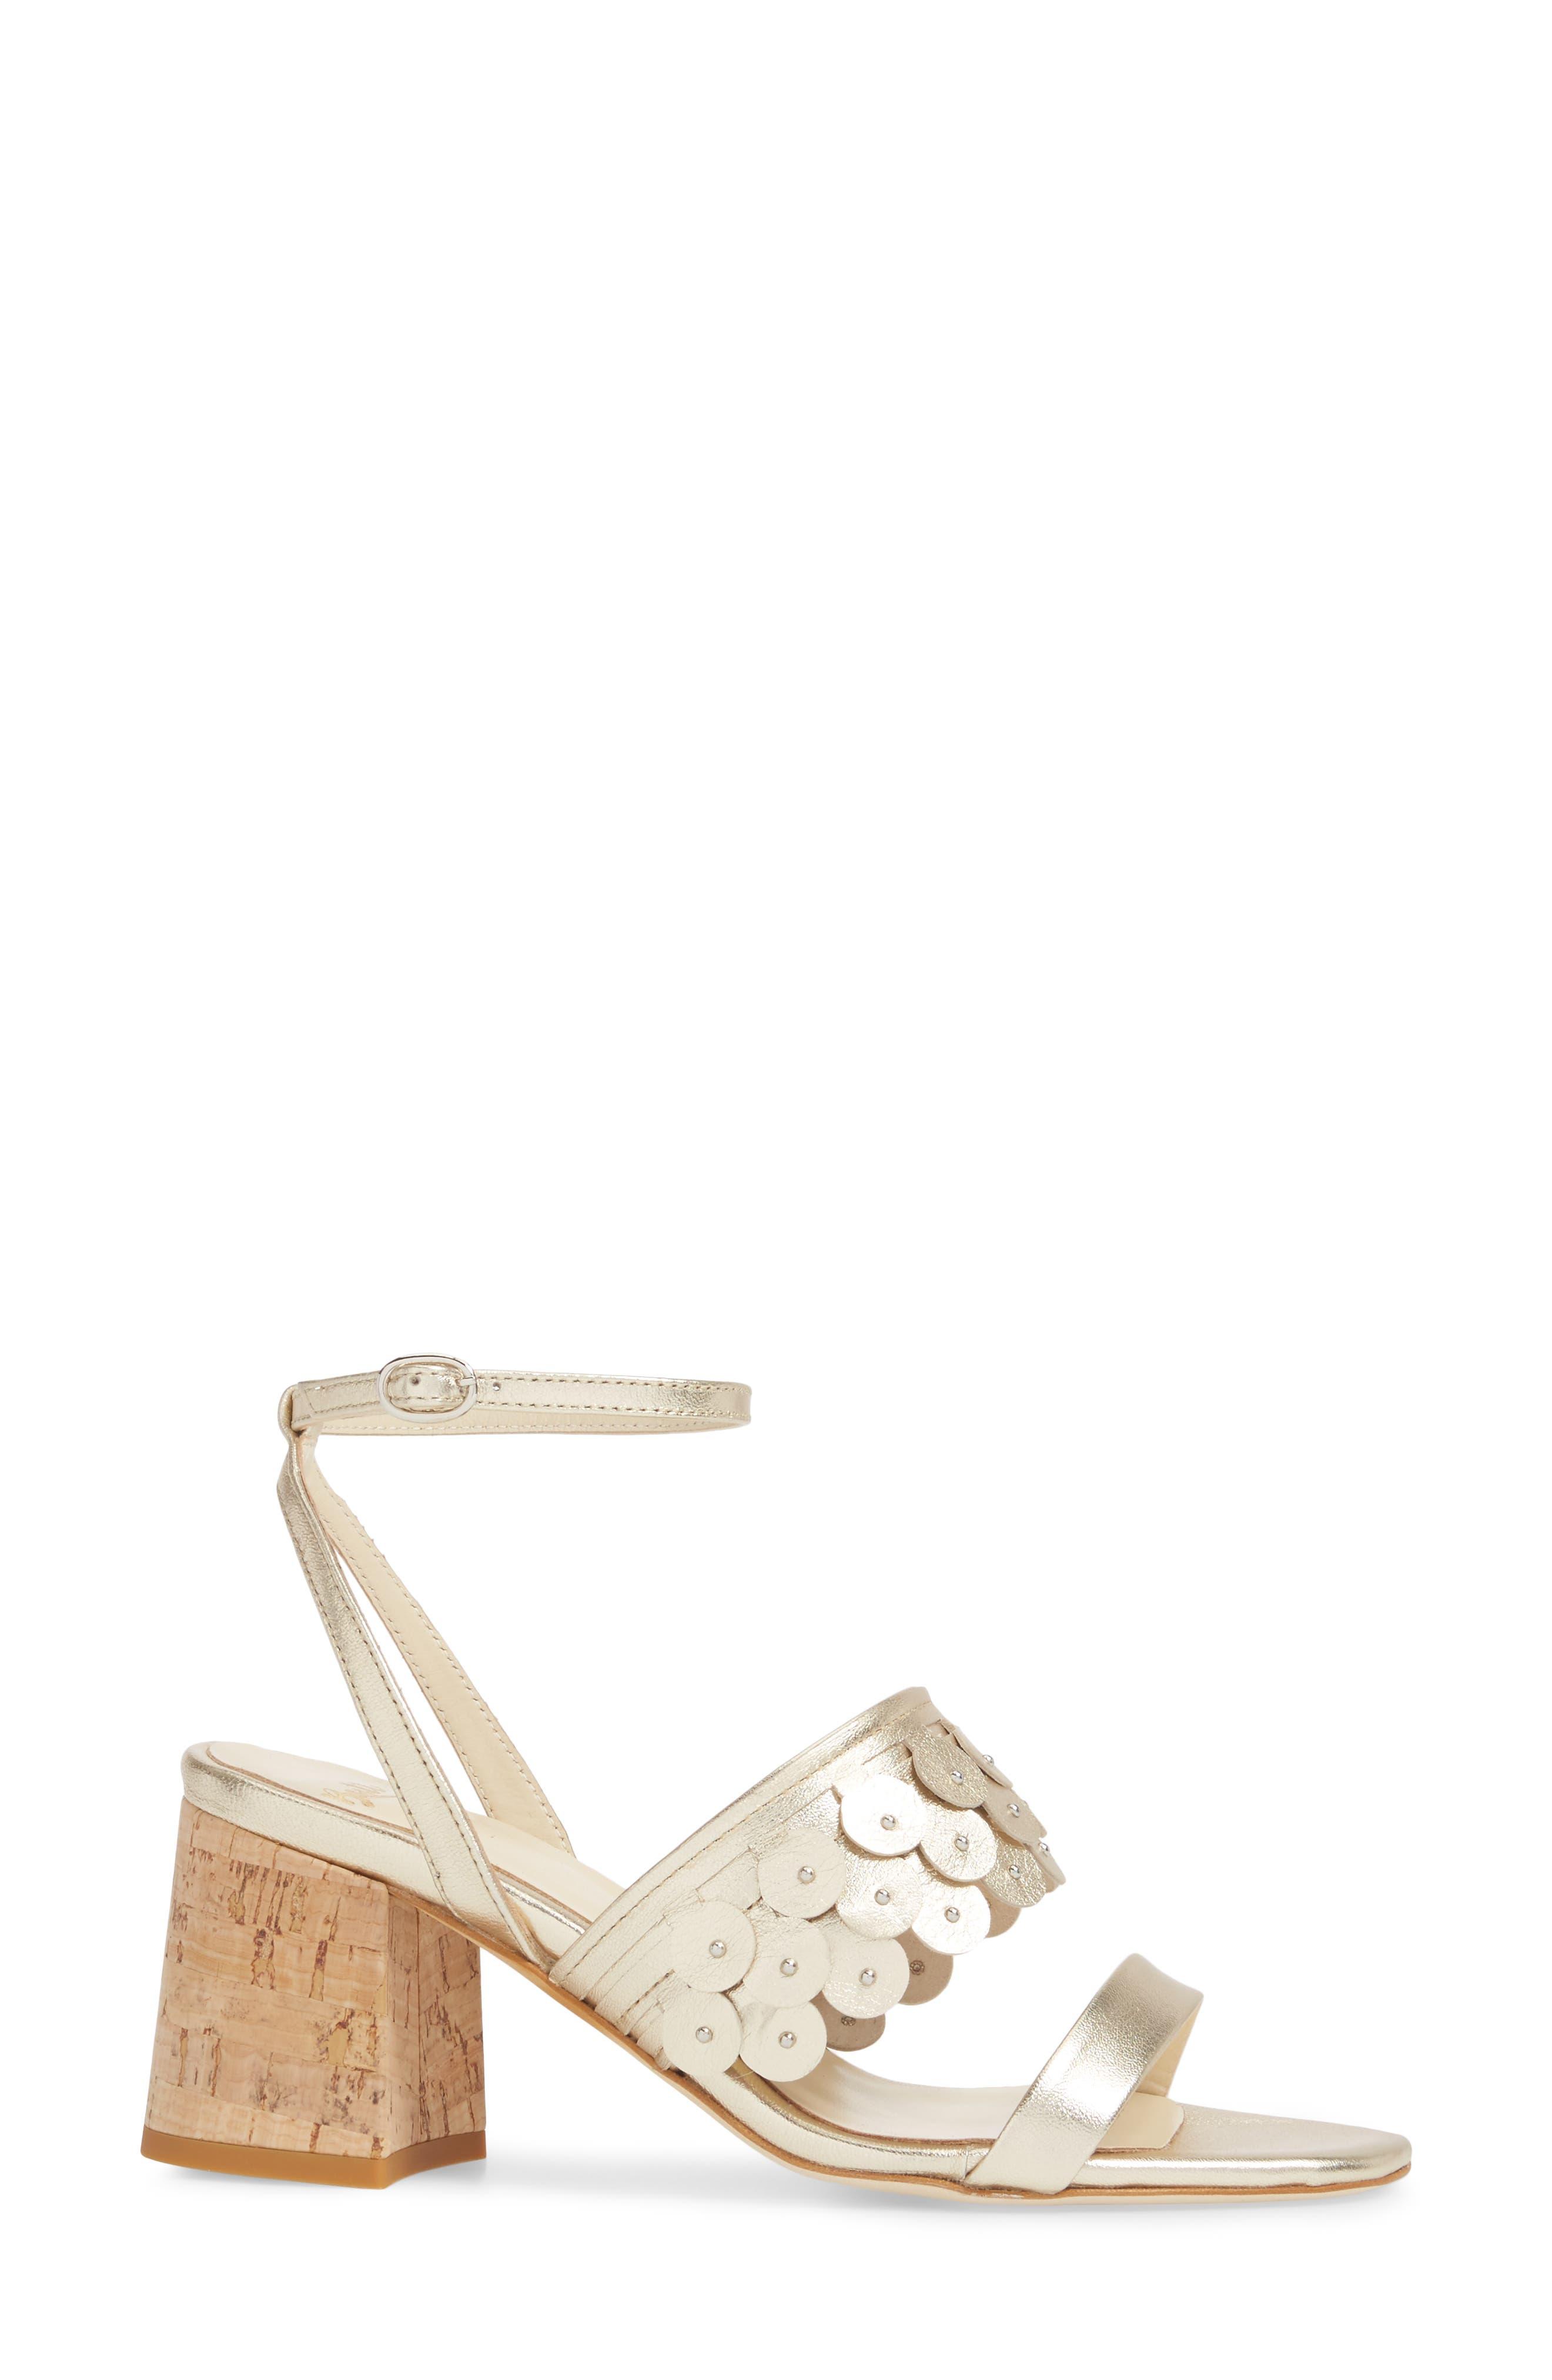 Butter Finley Studded Ankle Strap Sandal,                             Alternate thumbnail 3, color,                             Platino Napa